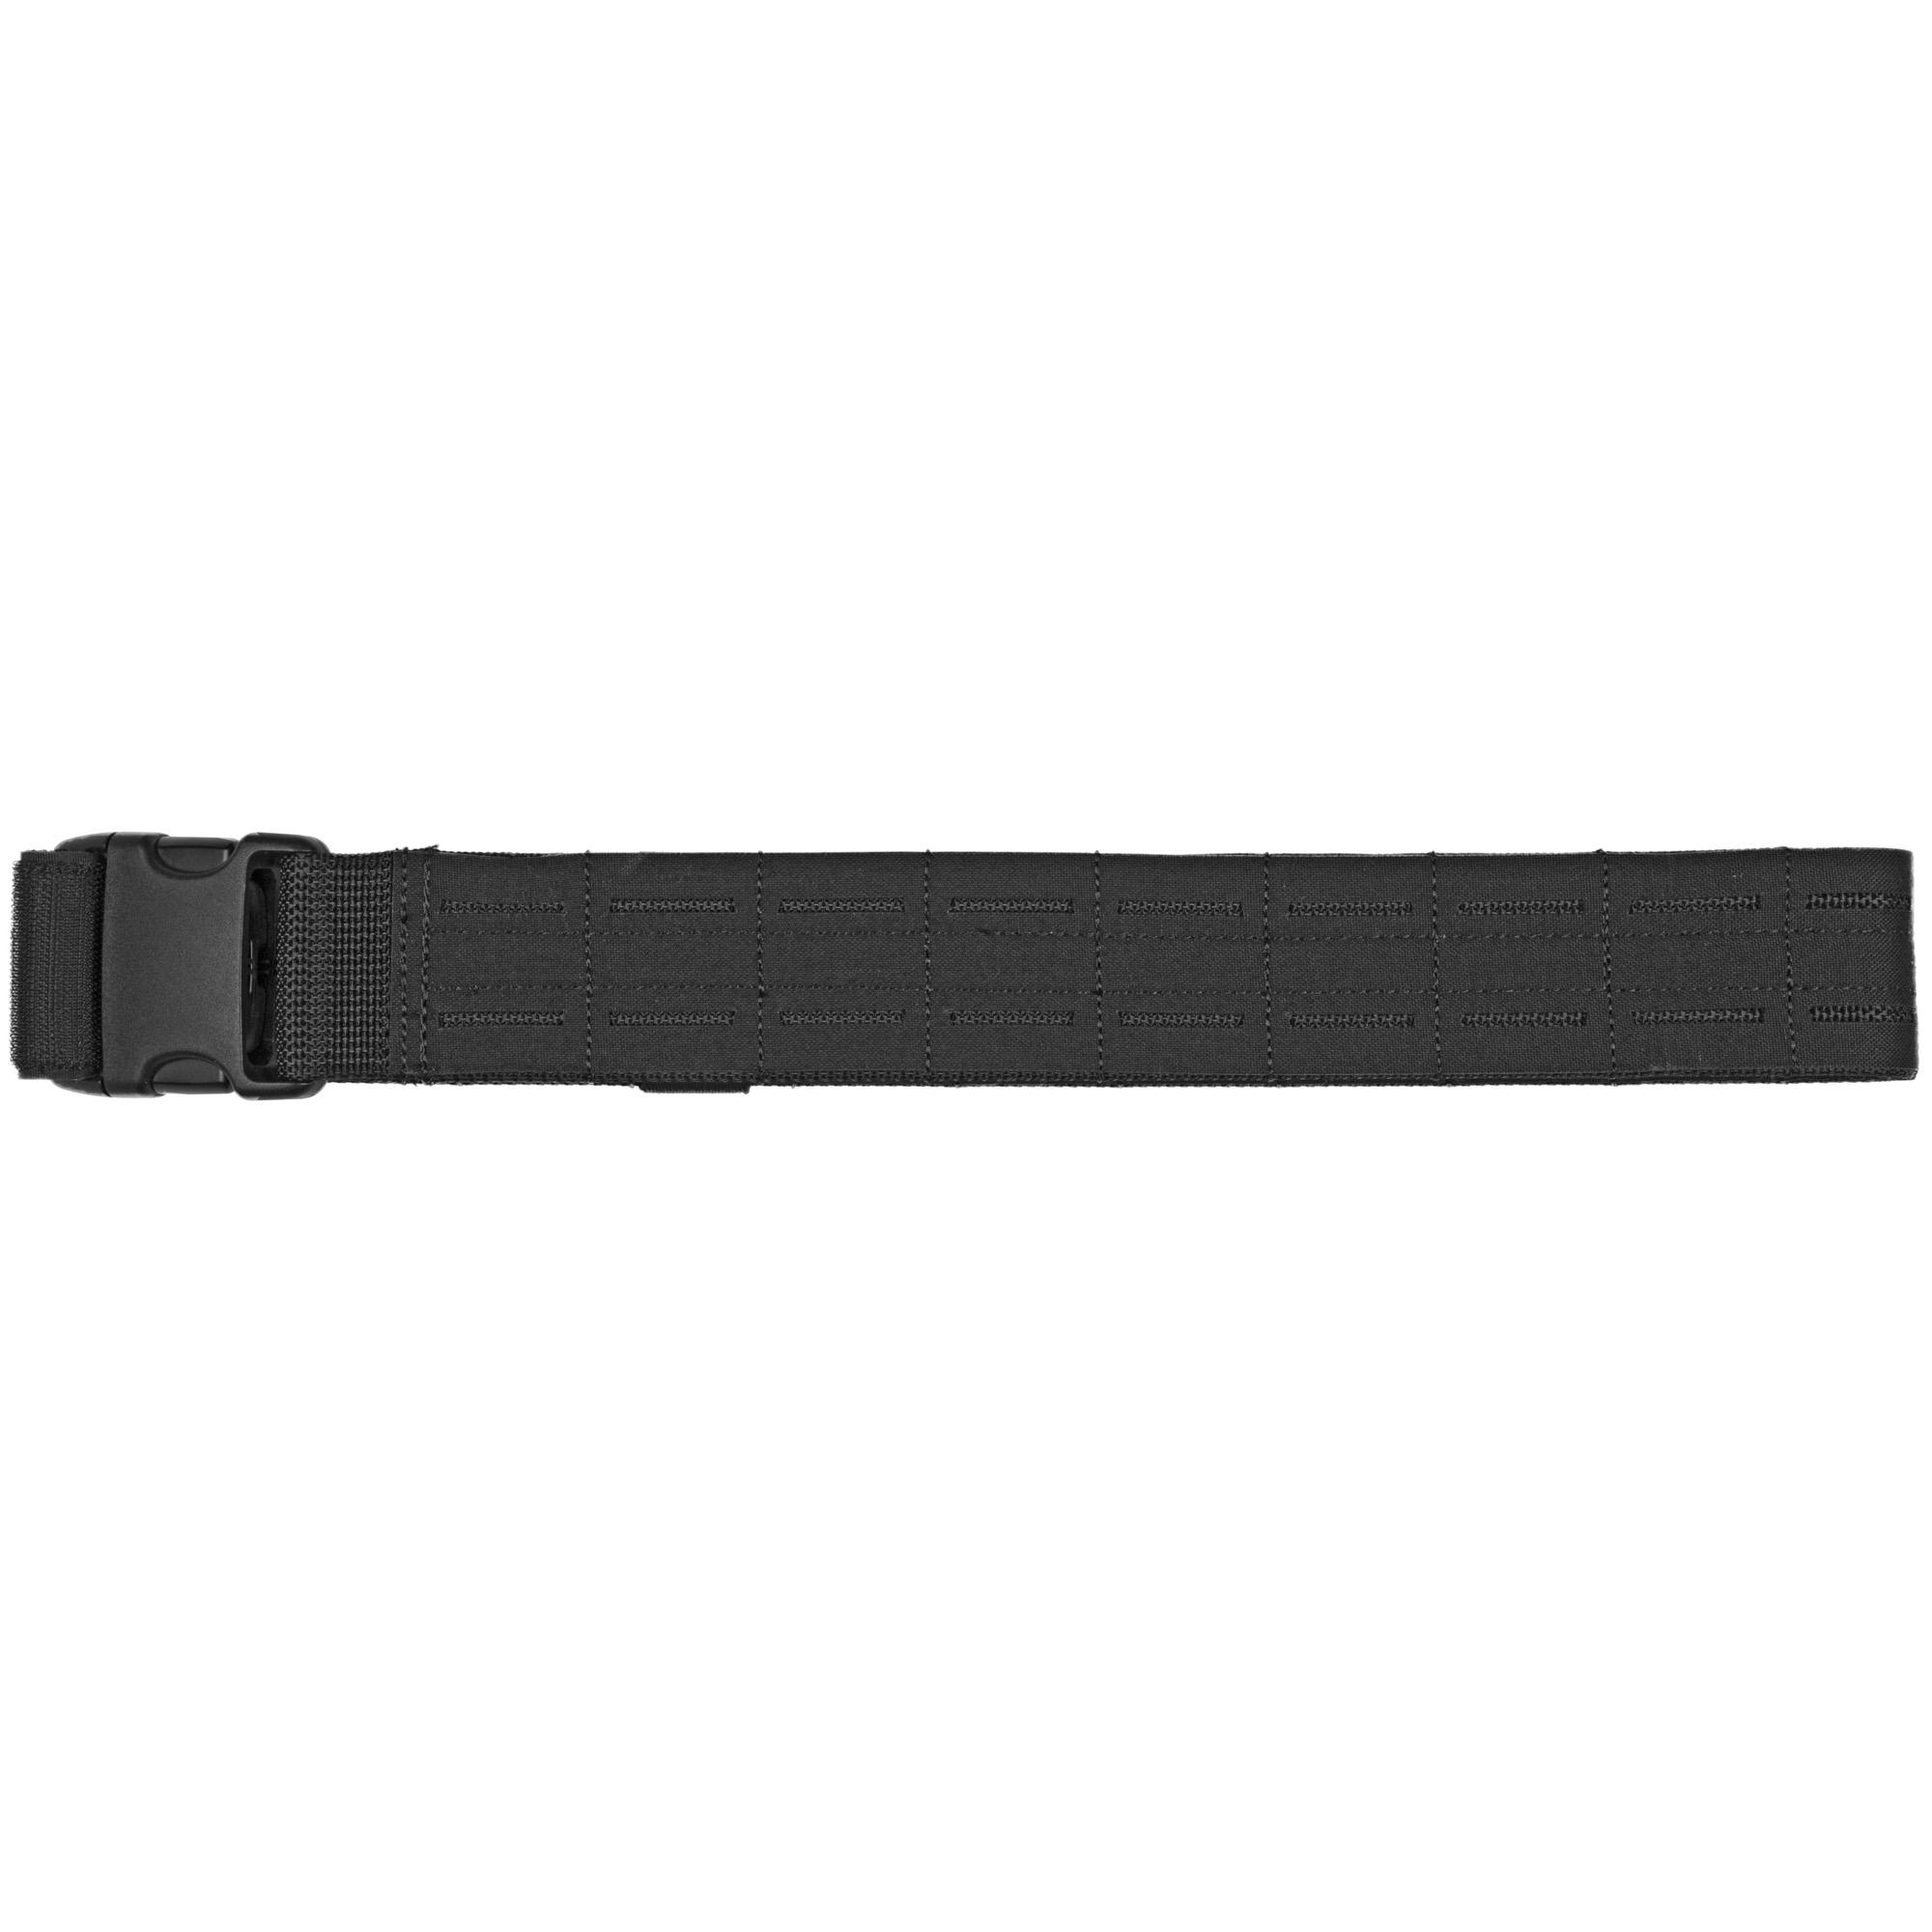 "Bh Foundation Belt Sm 29""-34"" Black"